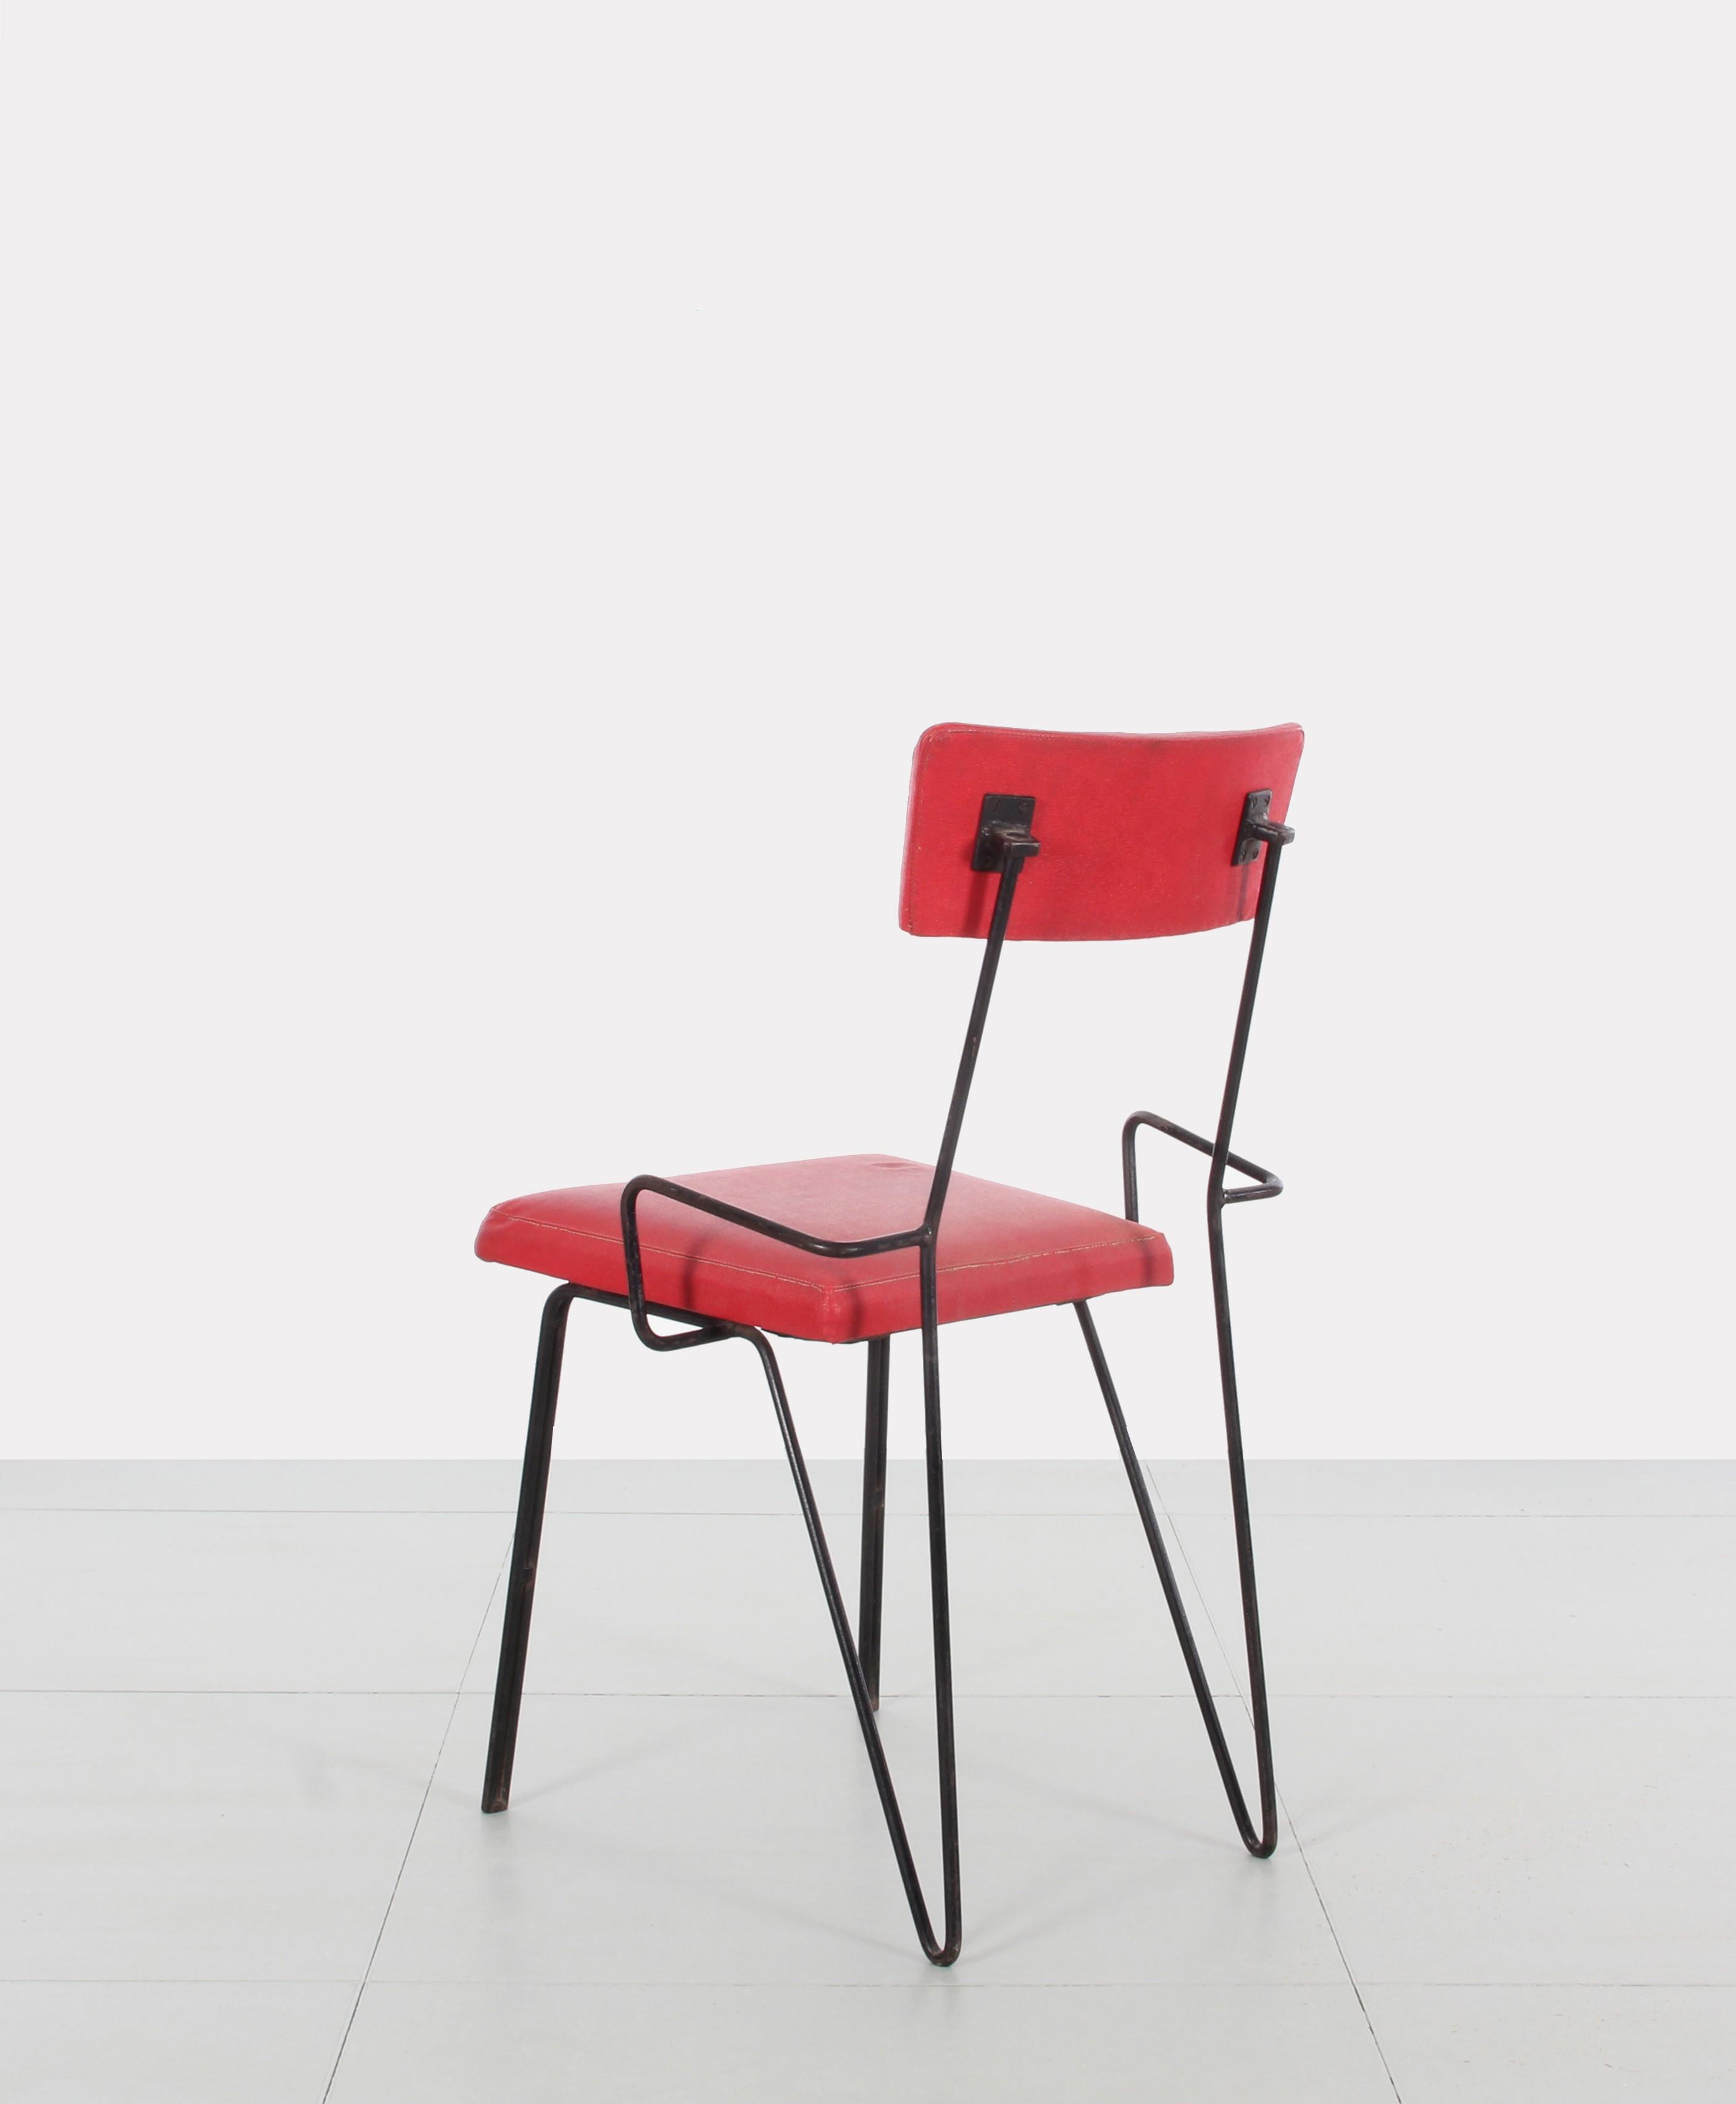 Pair of red metal chairs Soviet design  1960s  Design